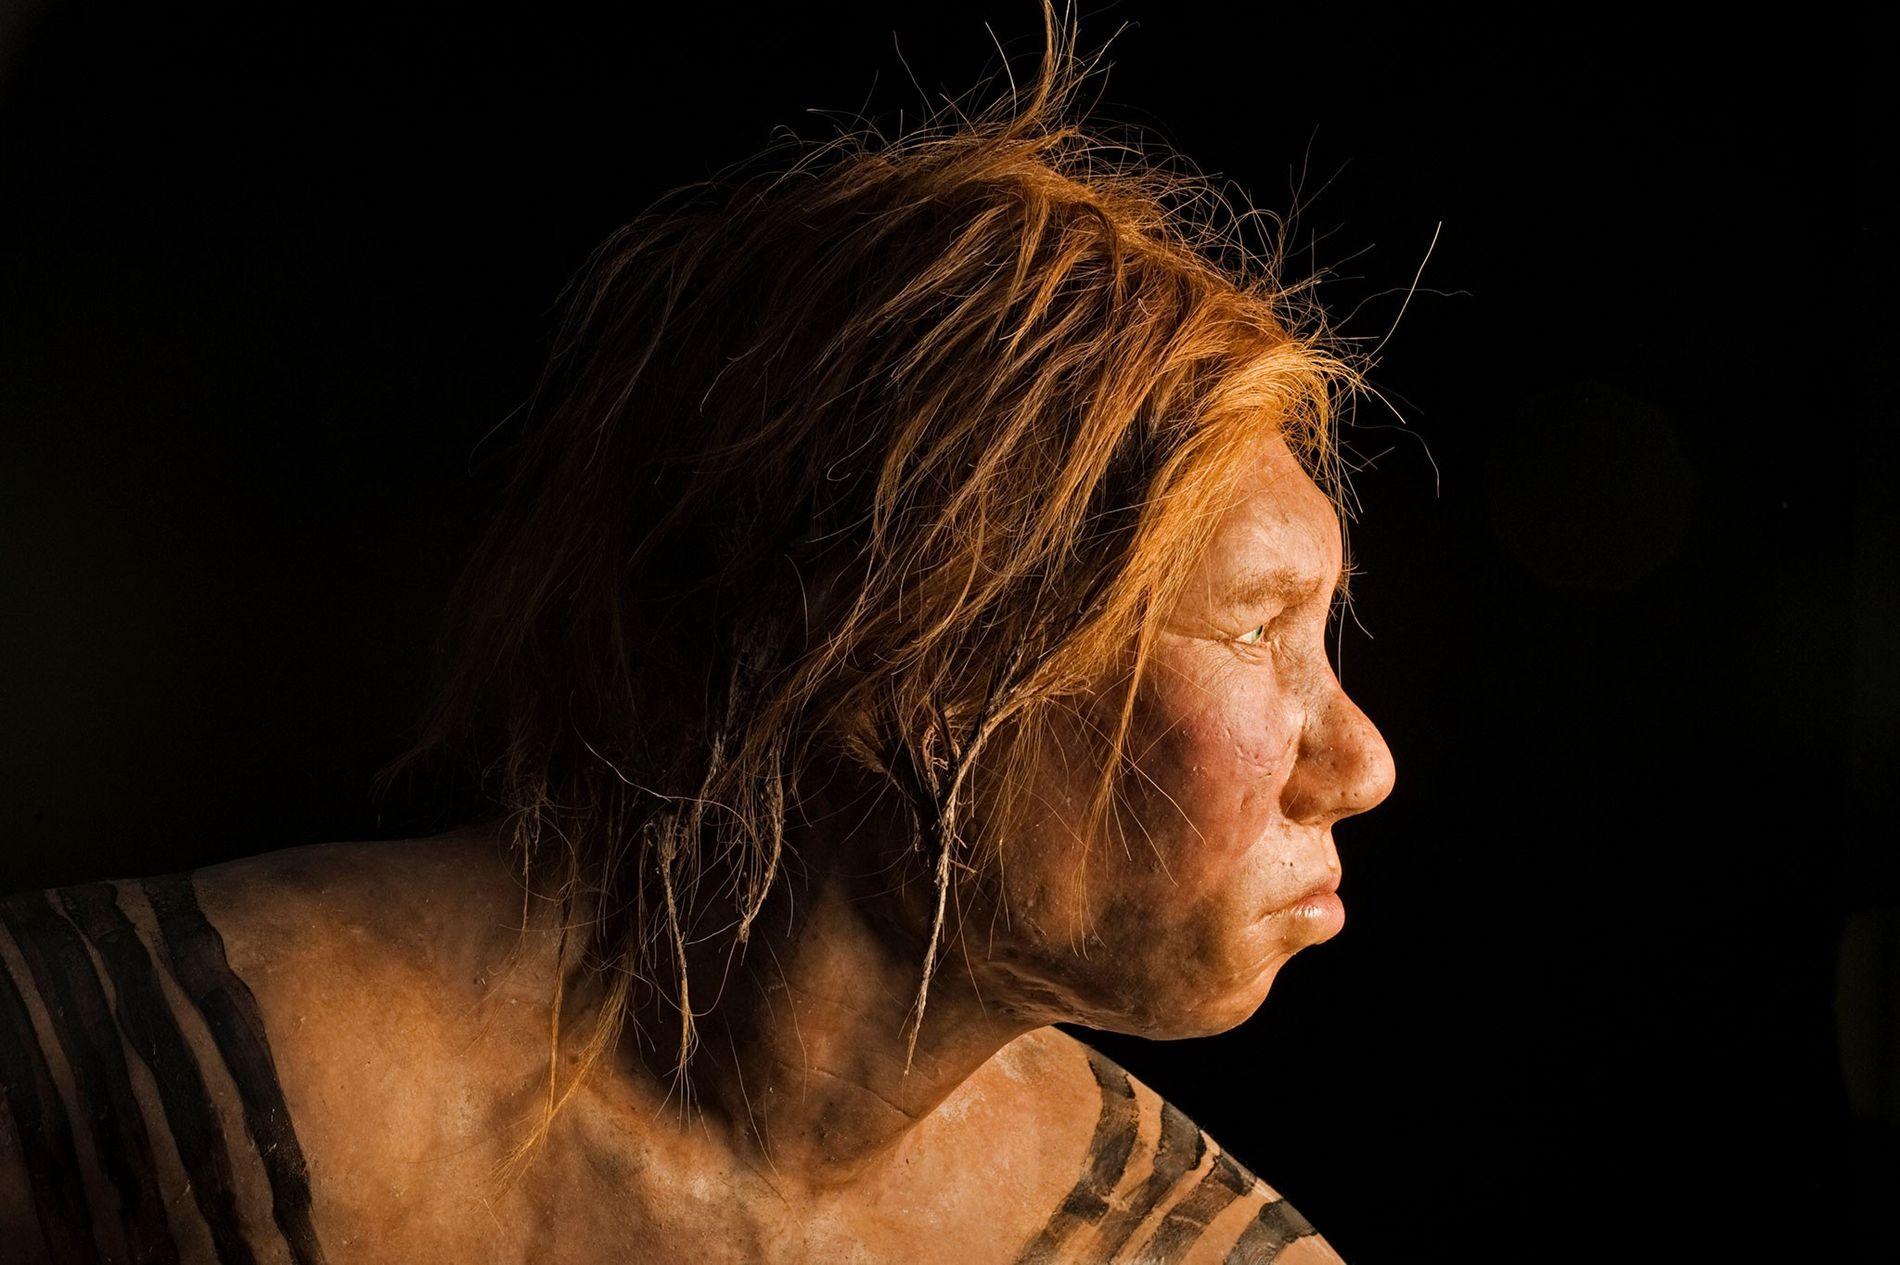 Mujer neandertal